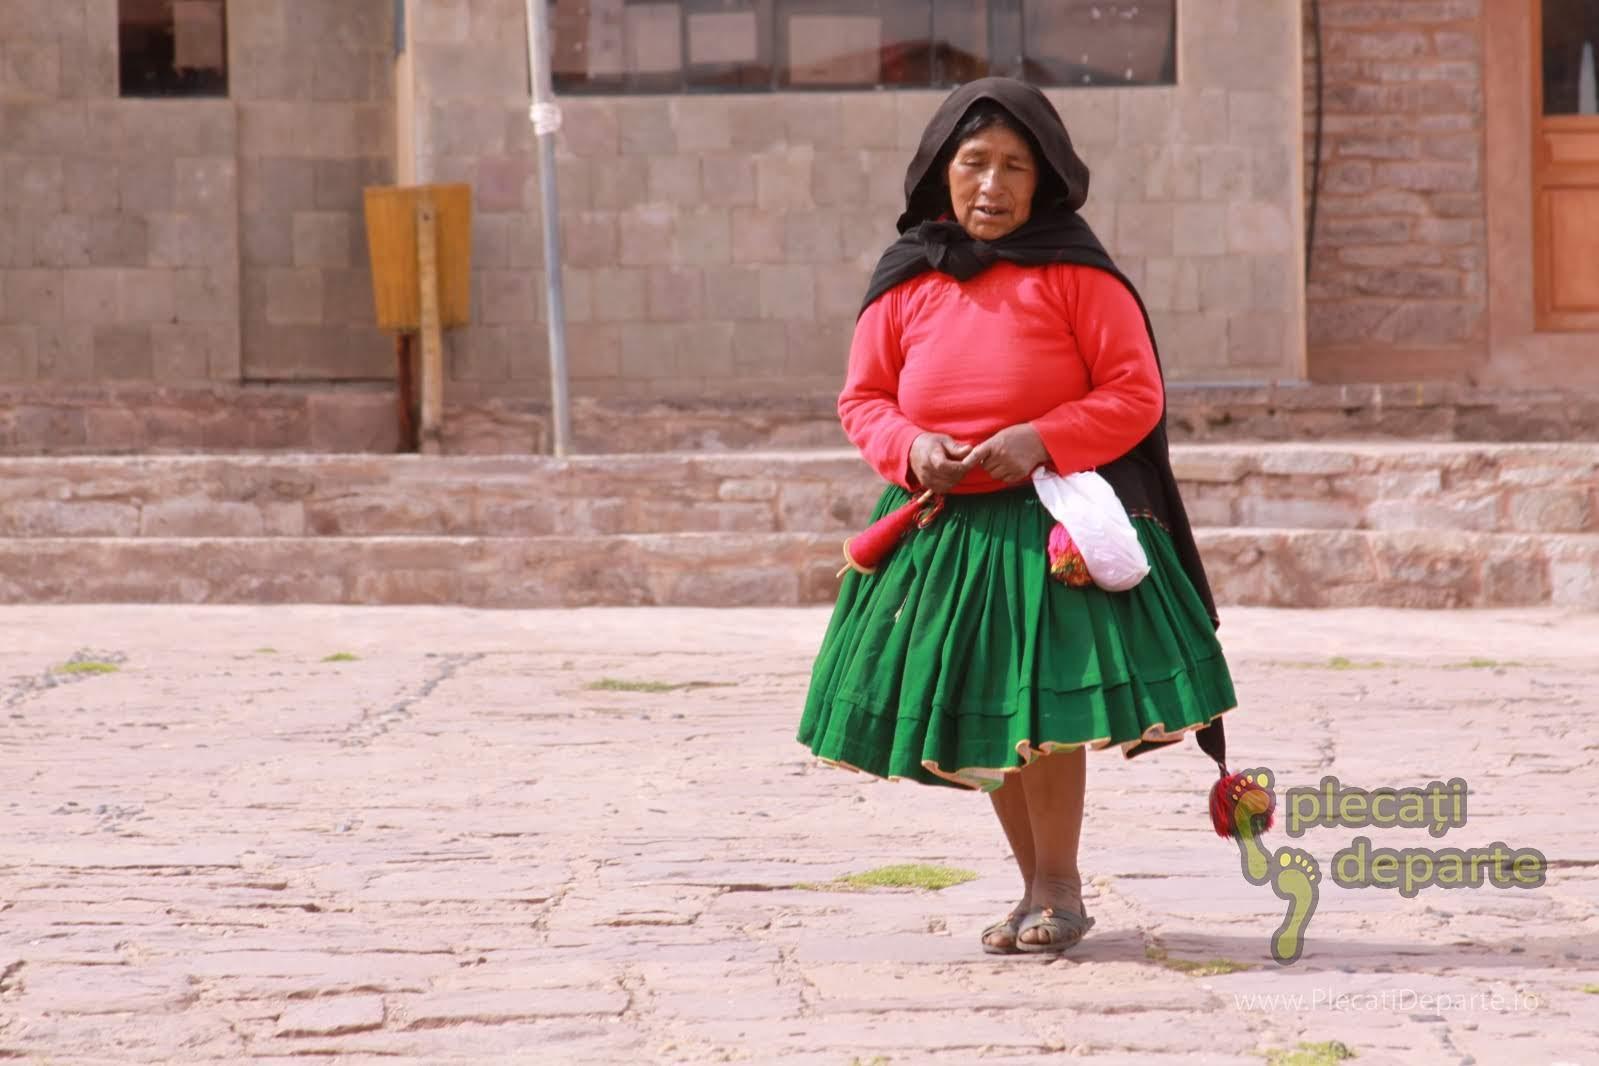 localnica de pe Insula Taquile, pe Lacul Titicaca, la 4000m in Peru